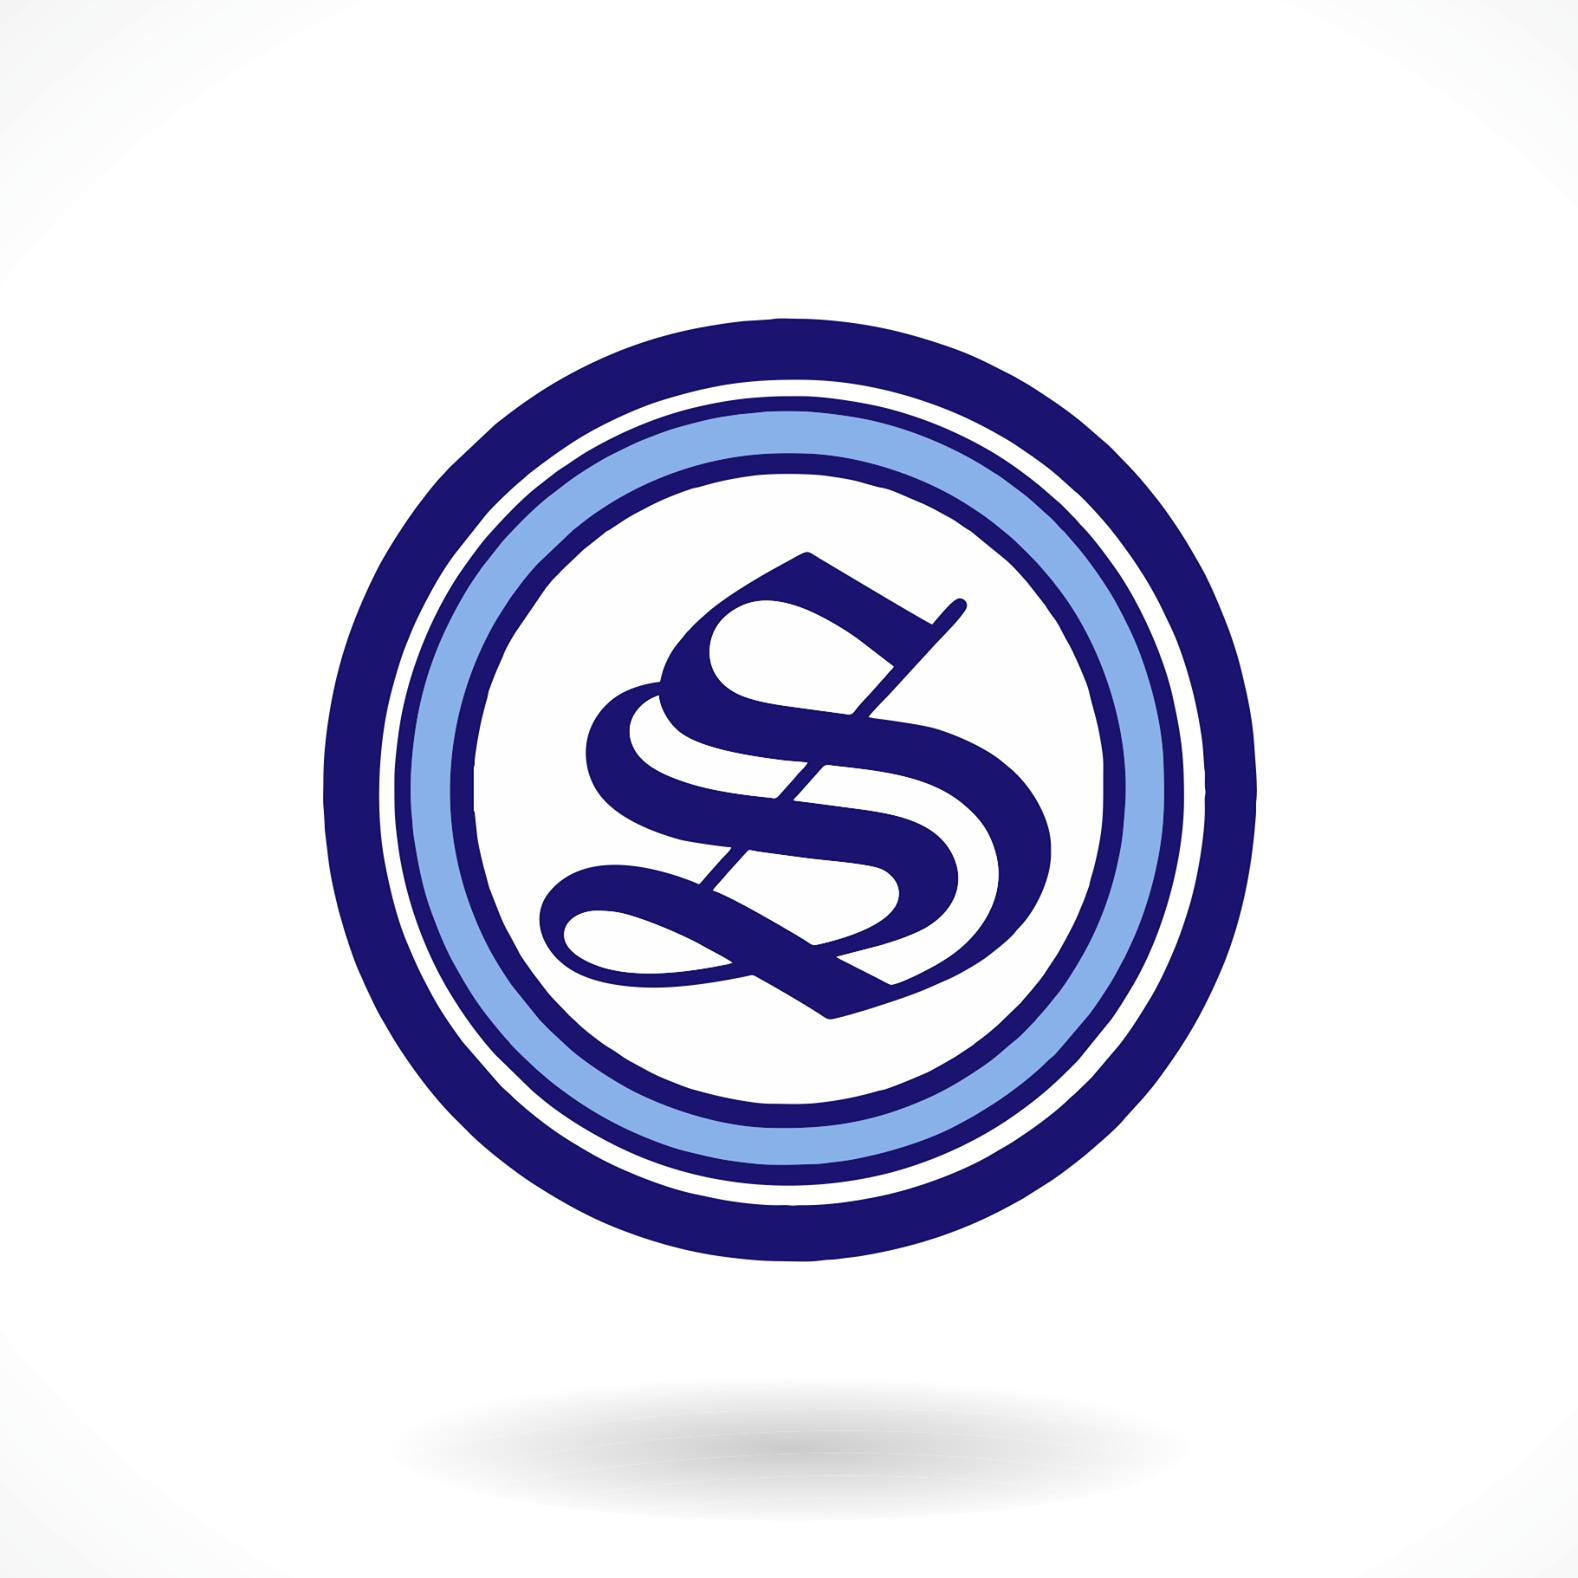 SARIOĞULLARI ŞTİ LTD logo